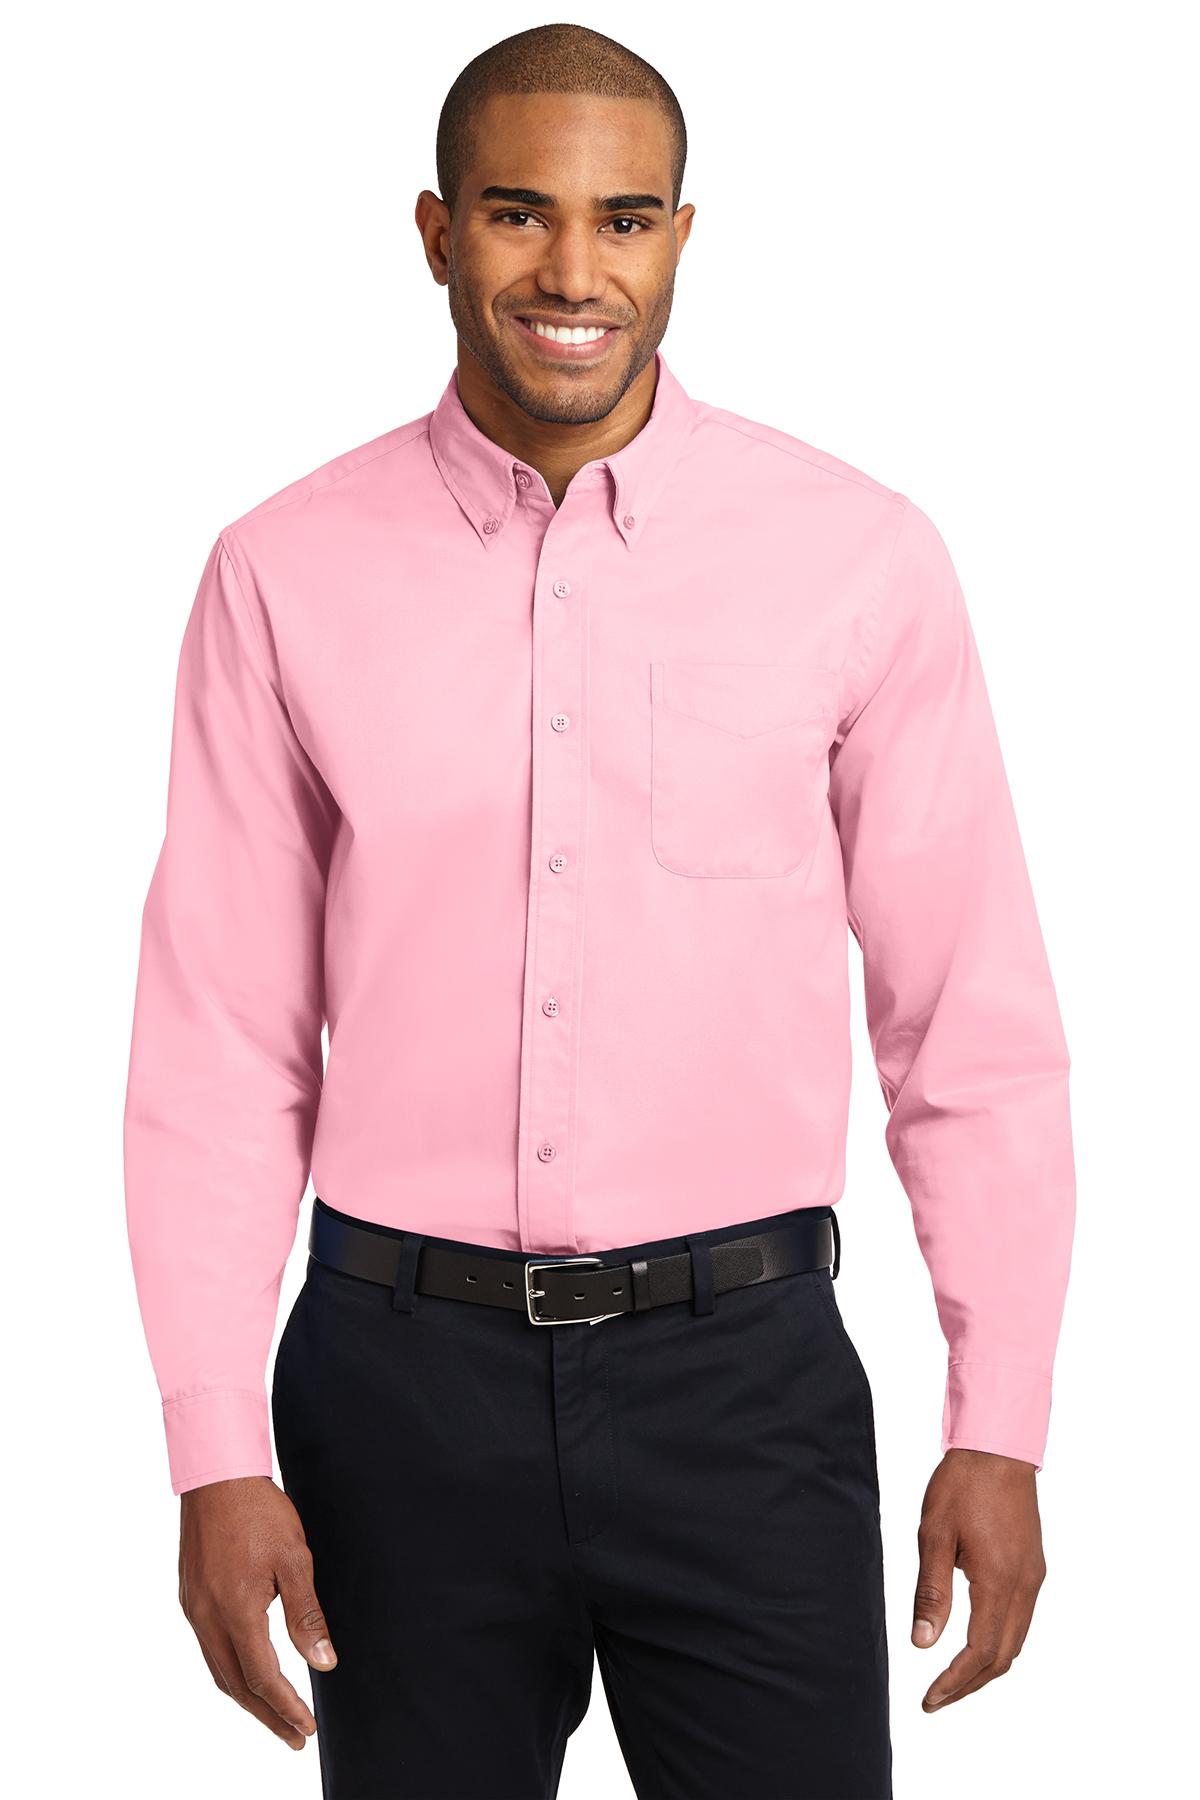 fd8779e2 Port Authority® Long Sleeve Easy Care Shirt | Cotton/Poly Blend ...